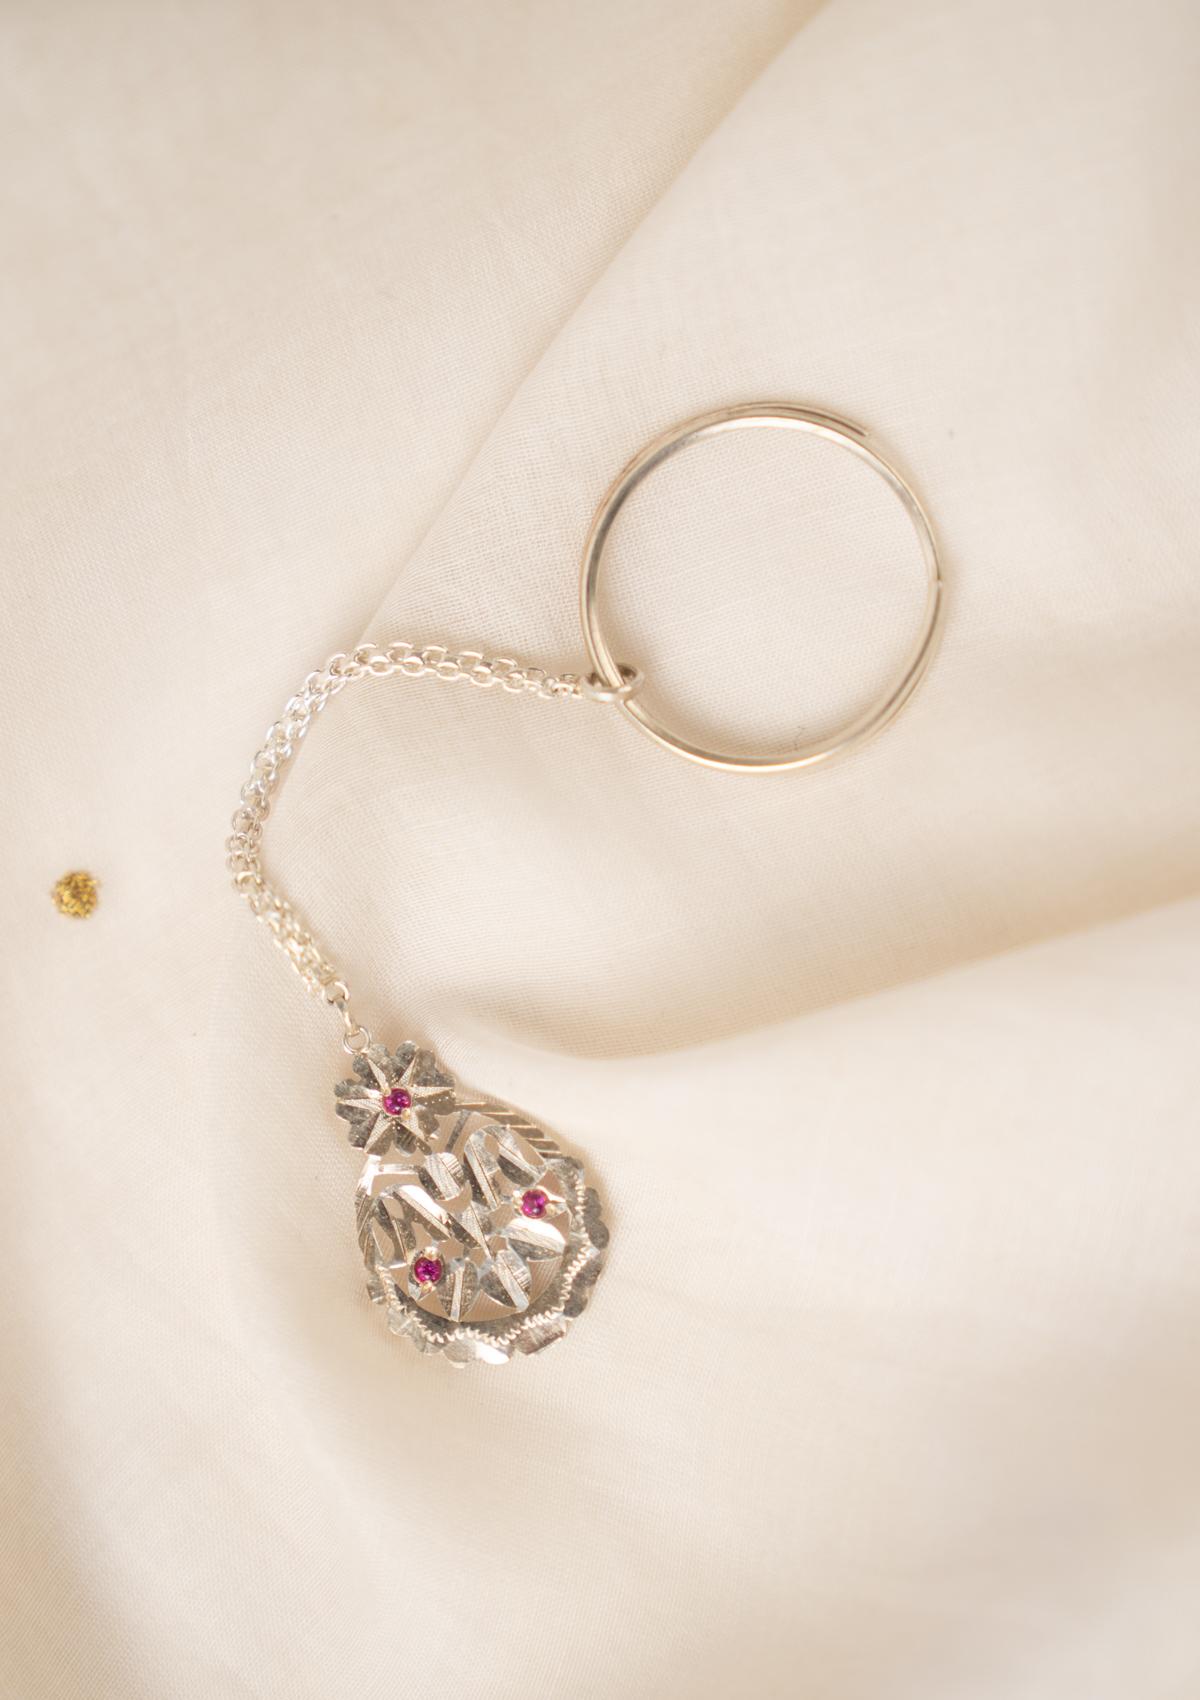 Samay Silver Keychain